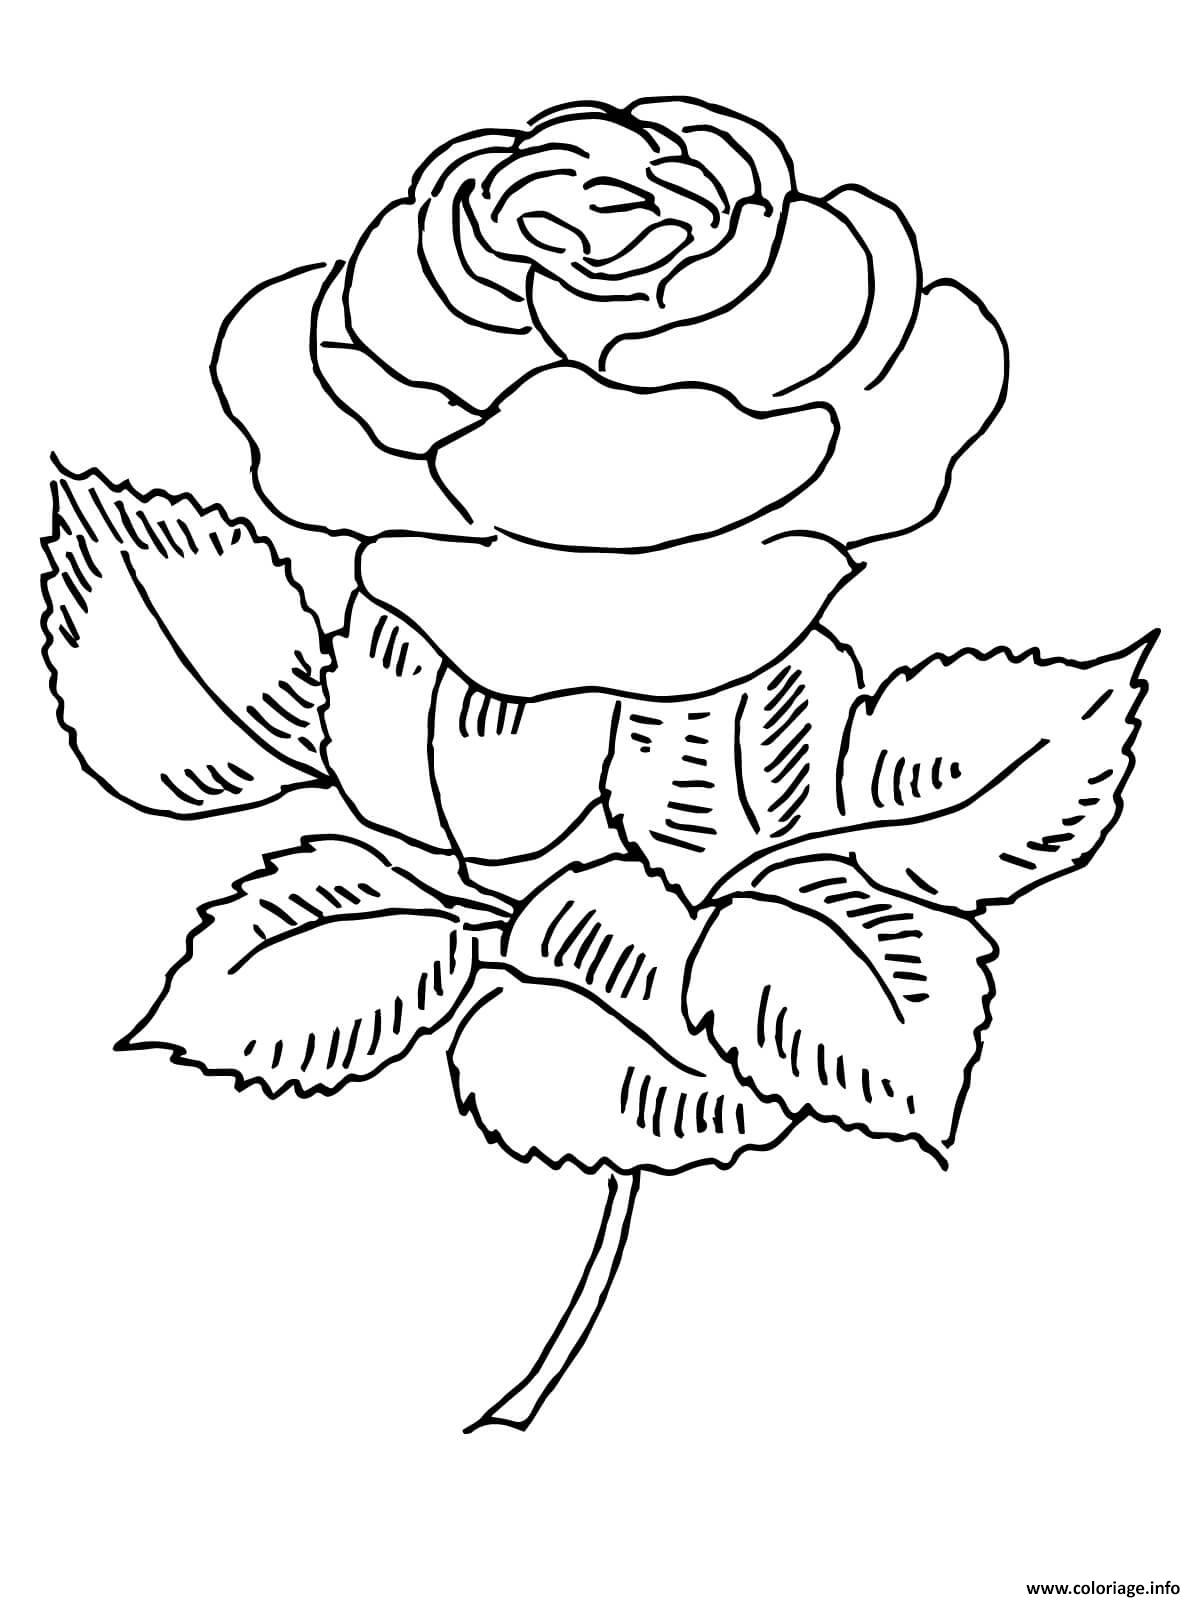 Coloriage Roses 130 dessin